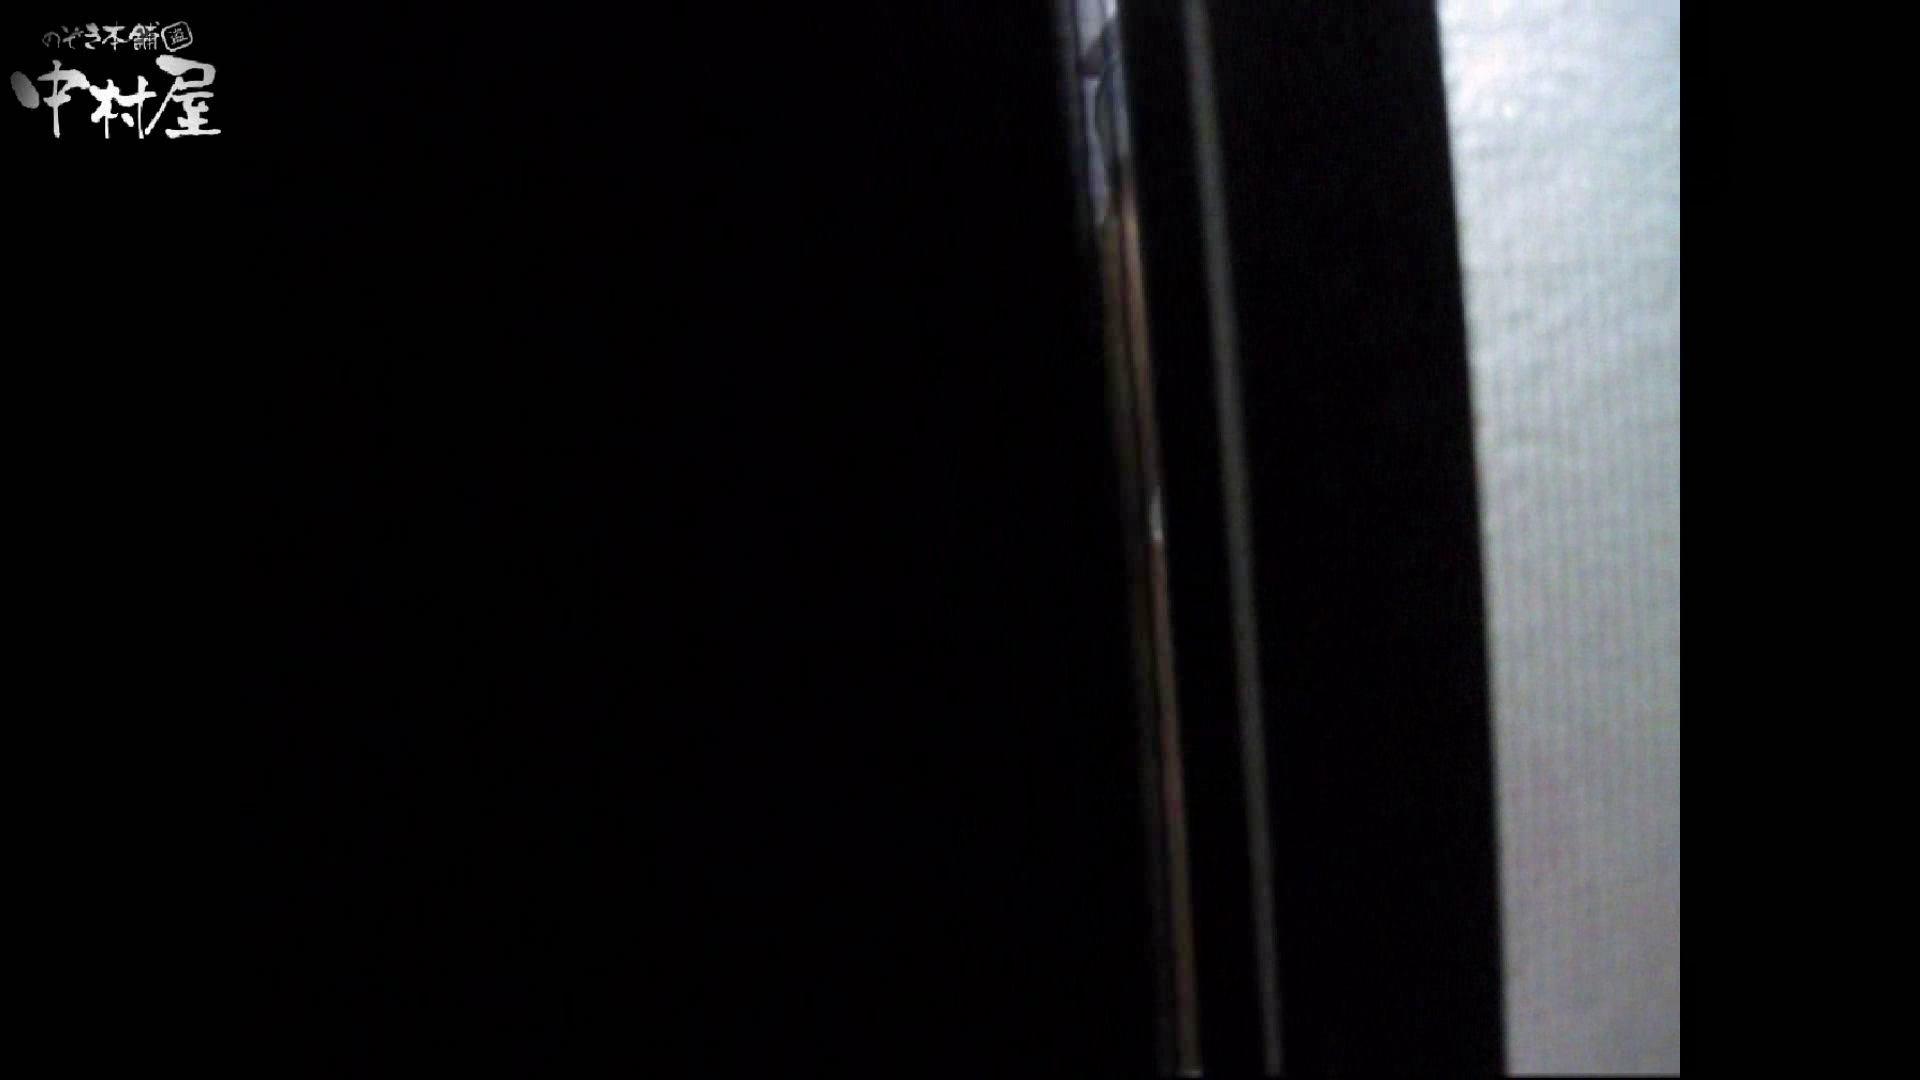 民家風呂専門盗撮師の超危険映像 vol.002 リアル股間  109Pix 61